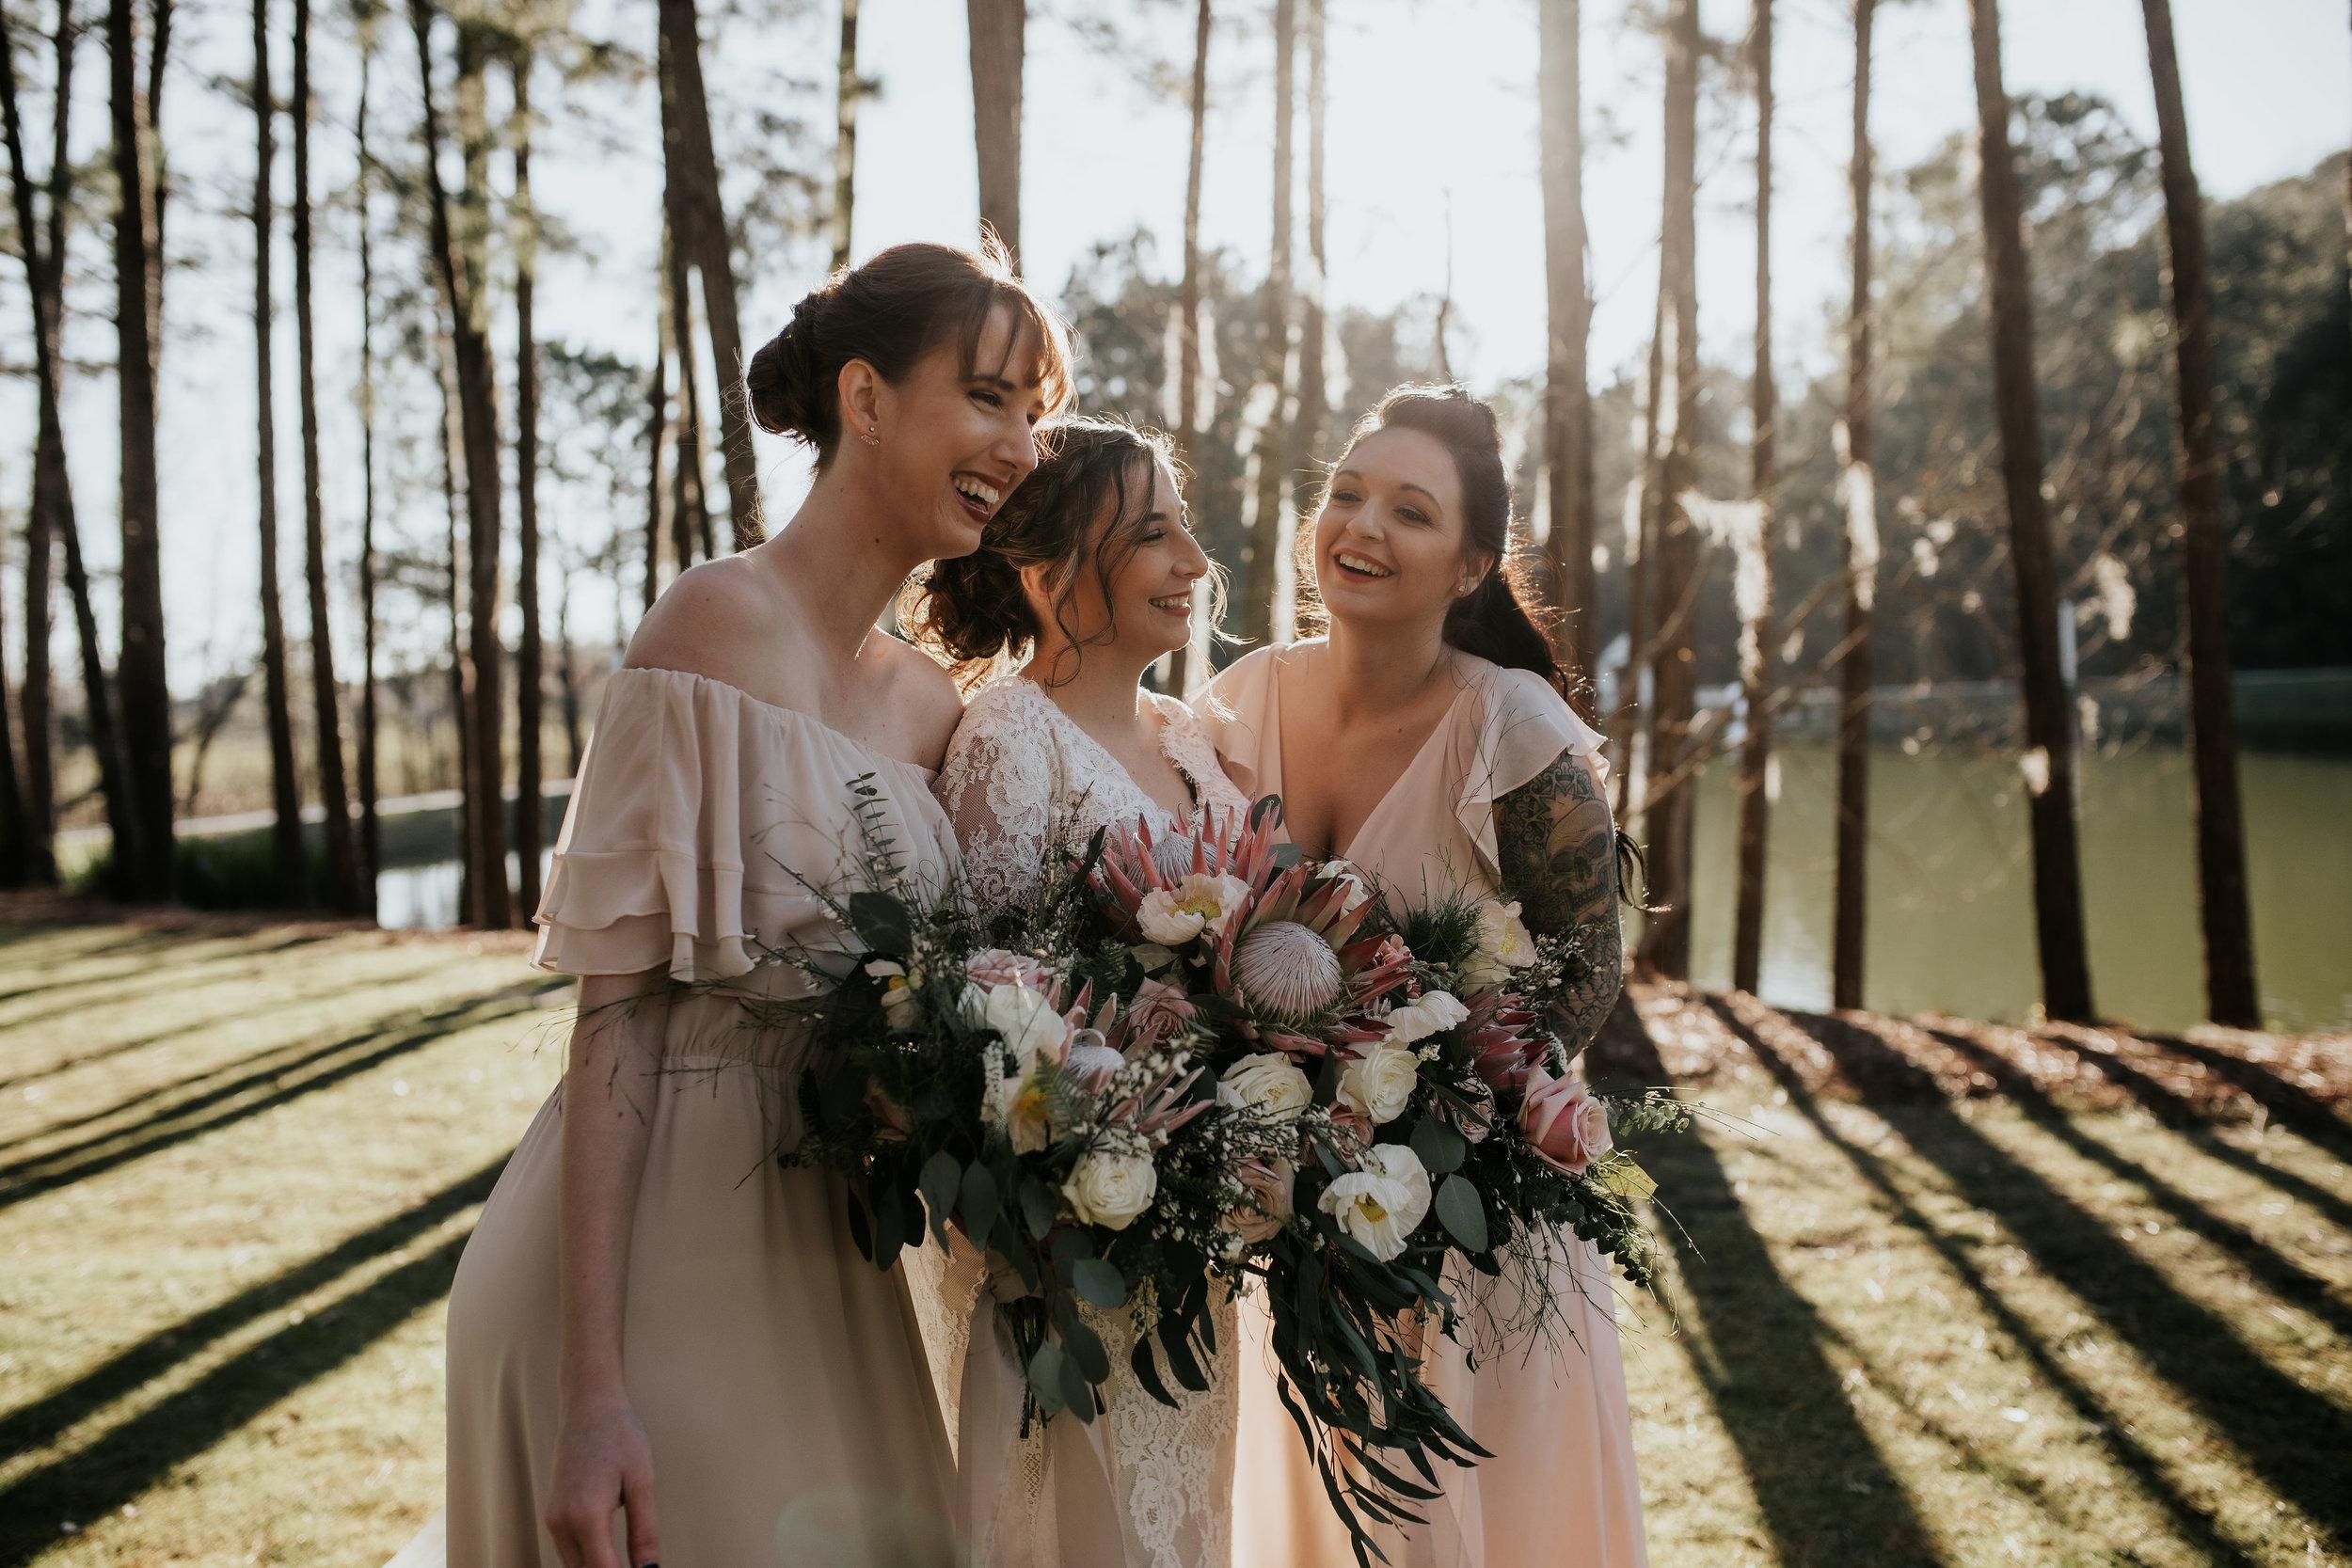 ivory-and-beau-blog-mackey-house-styled-shoot-savannah-wedding-bridal-boutique-savannah-florist-southern-wedding-_G5A2540.jpg